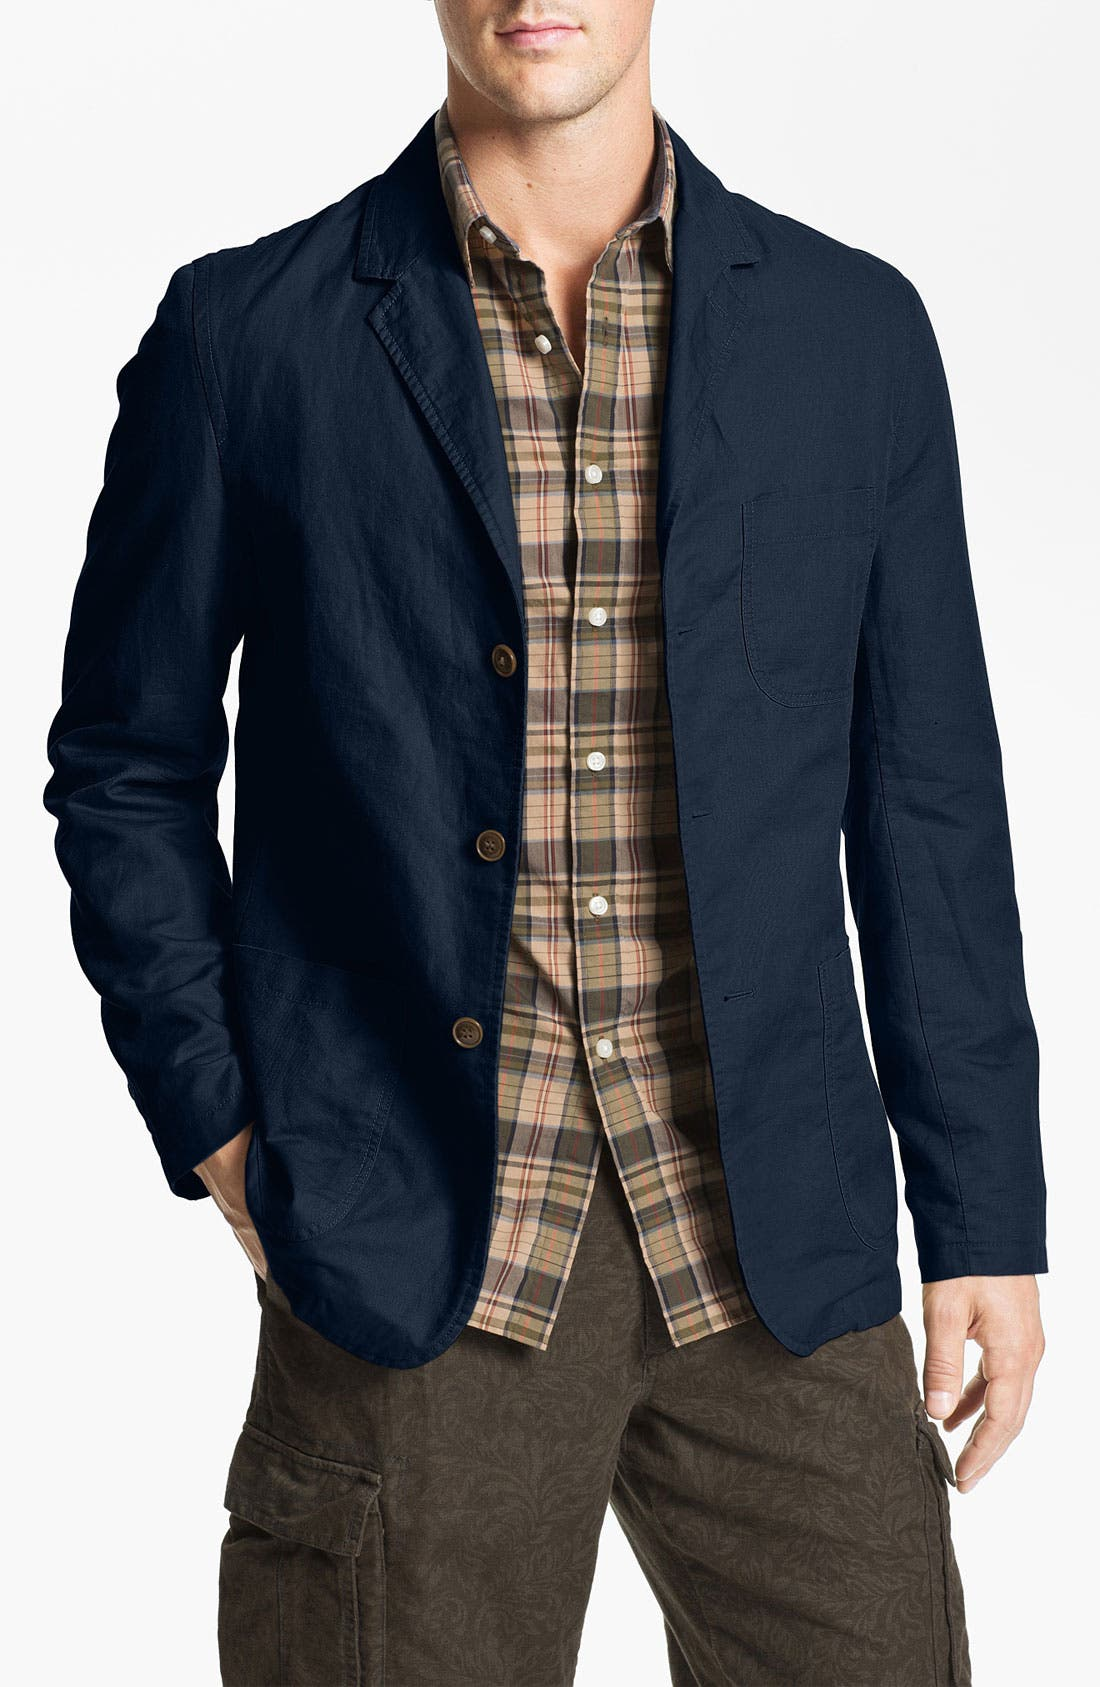 Alternate Image 1 Selected - Wallin & Bros. 'Hamilton' Twill Sportcoat